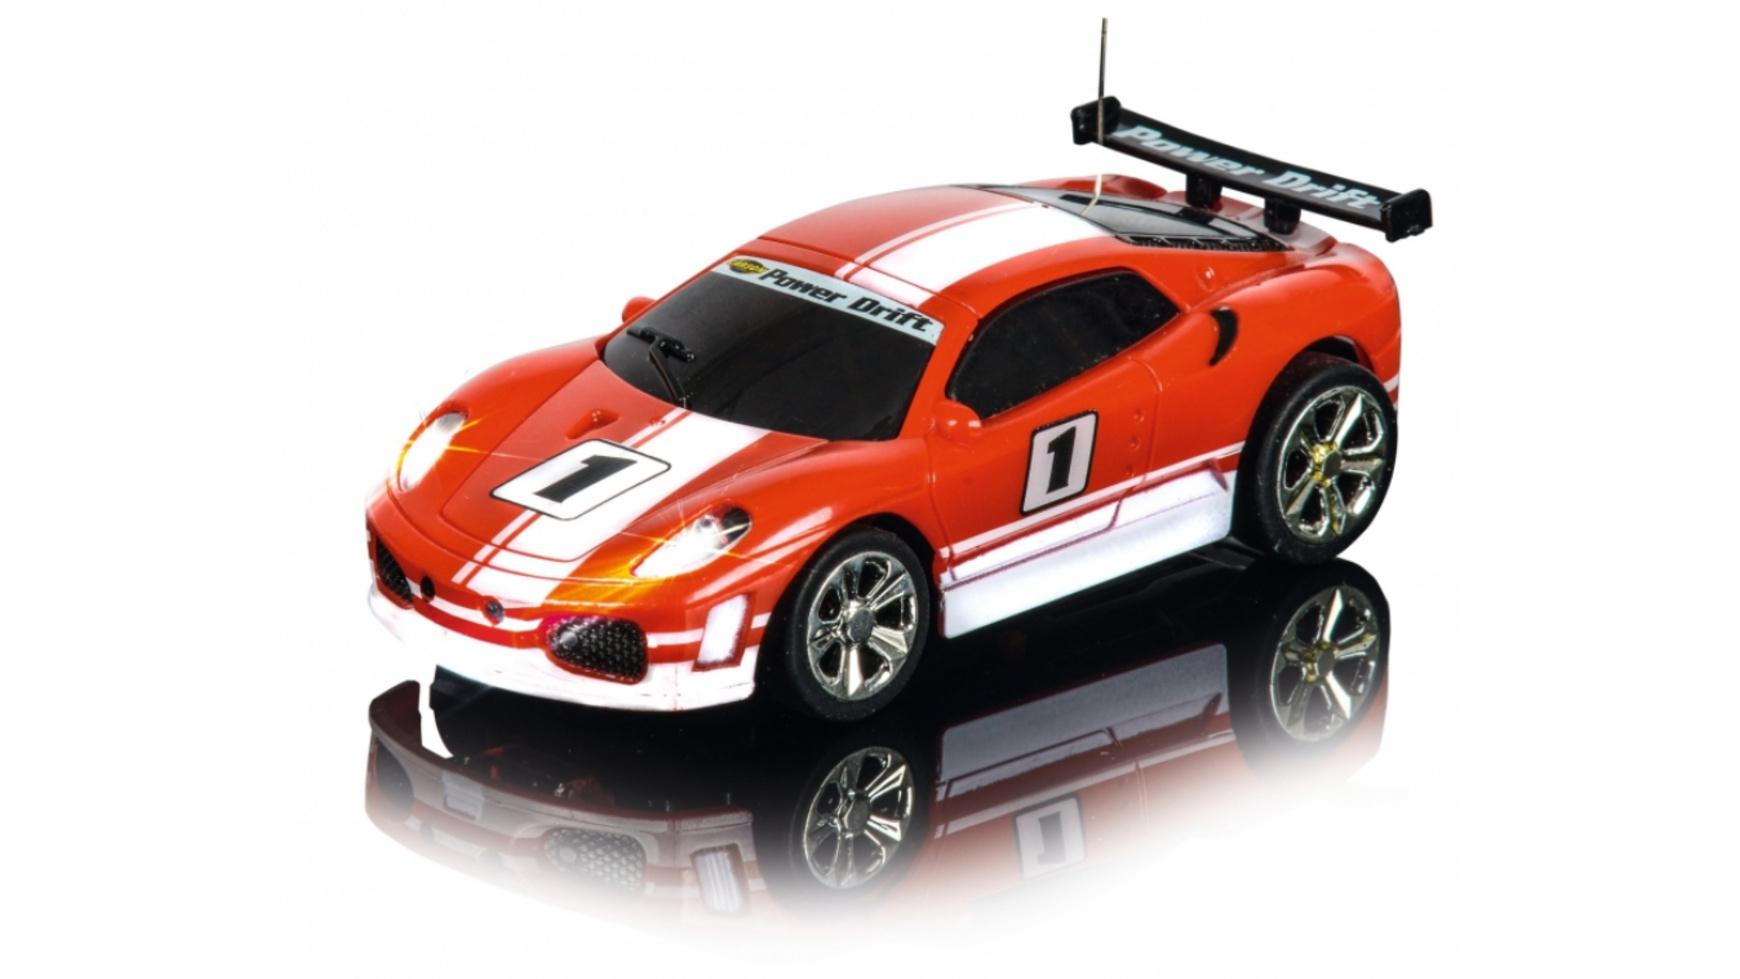 [Müller online] Carson 500404112 RC Nano Racer Power Drift 1:60 ferngesteuertes Rennauto